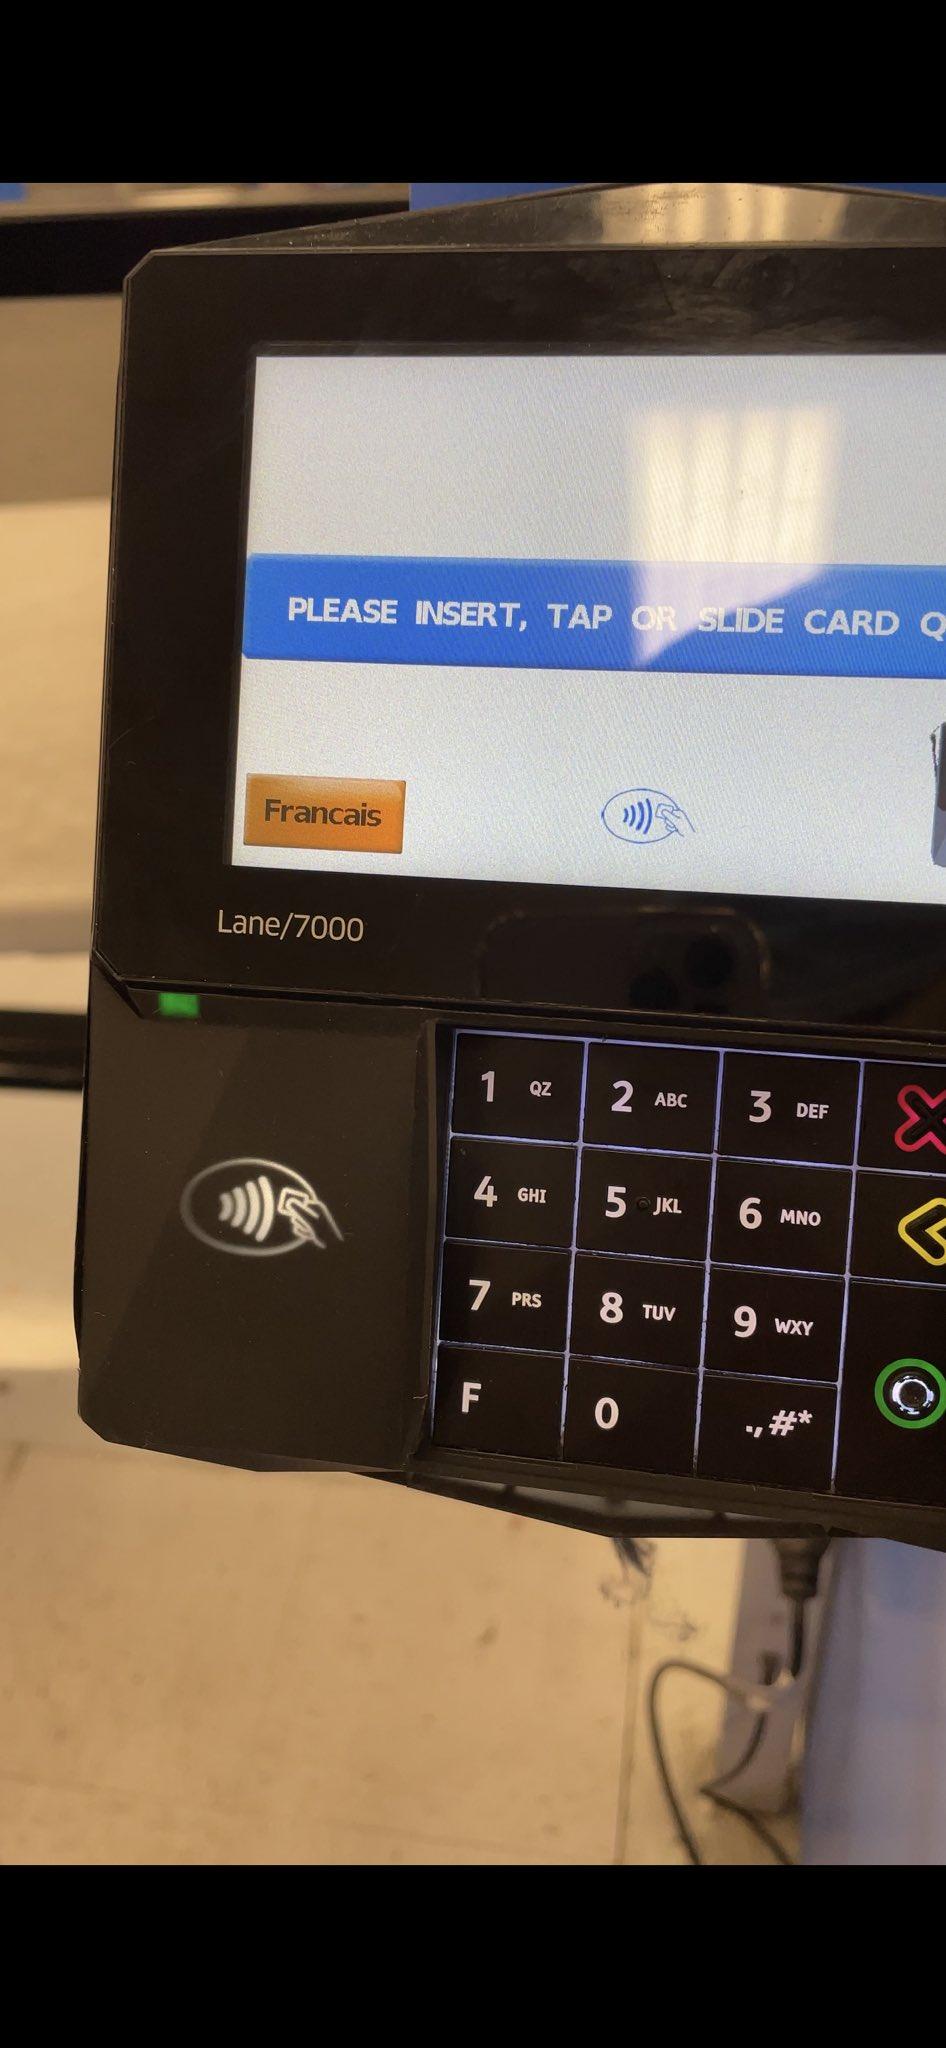 Walmart Apple Pay